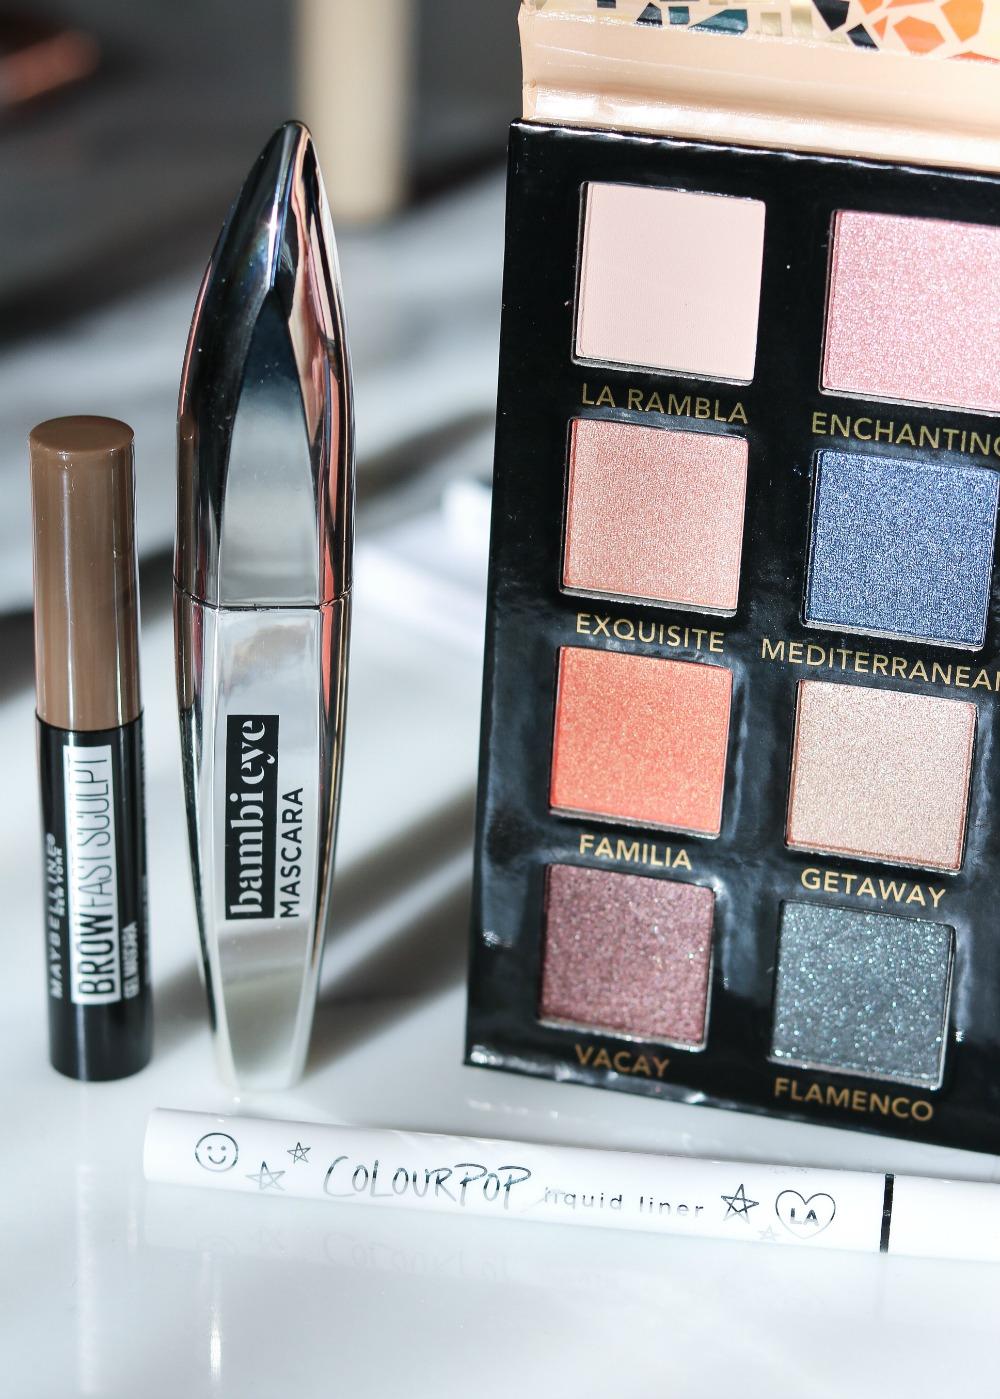 New Drugstore Makeup Products Testing I Maybelline Brow Gel, Loreal Bambi Mascara, Colourpop Liquid Eyeliner